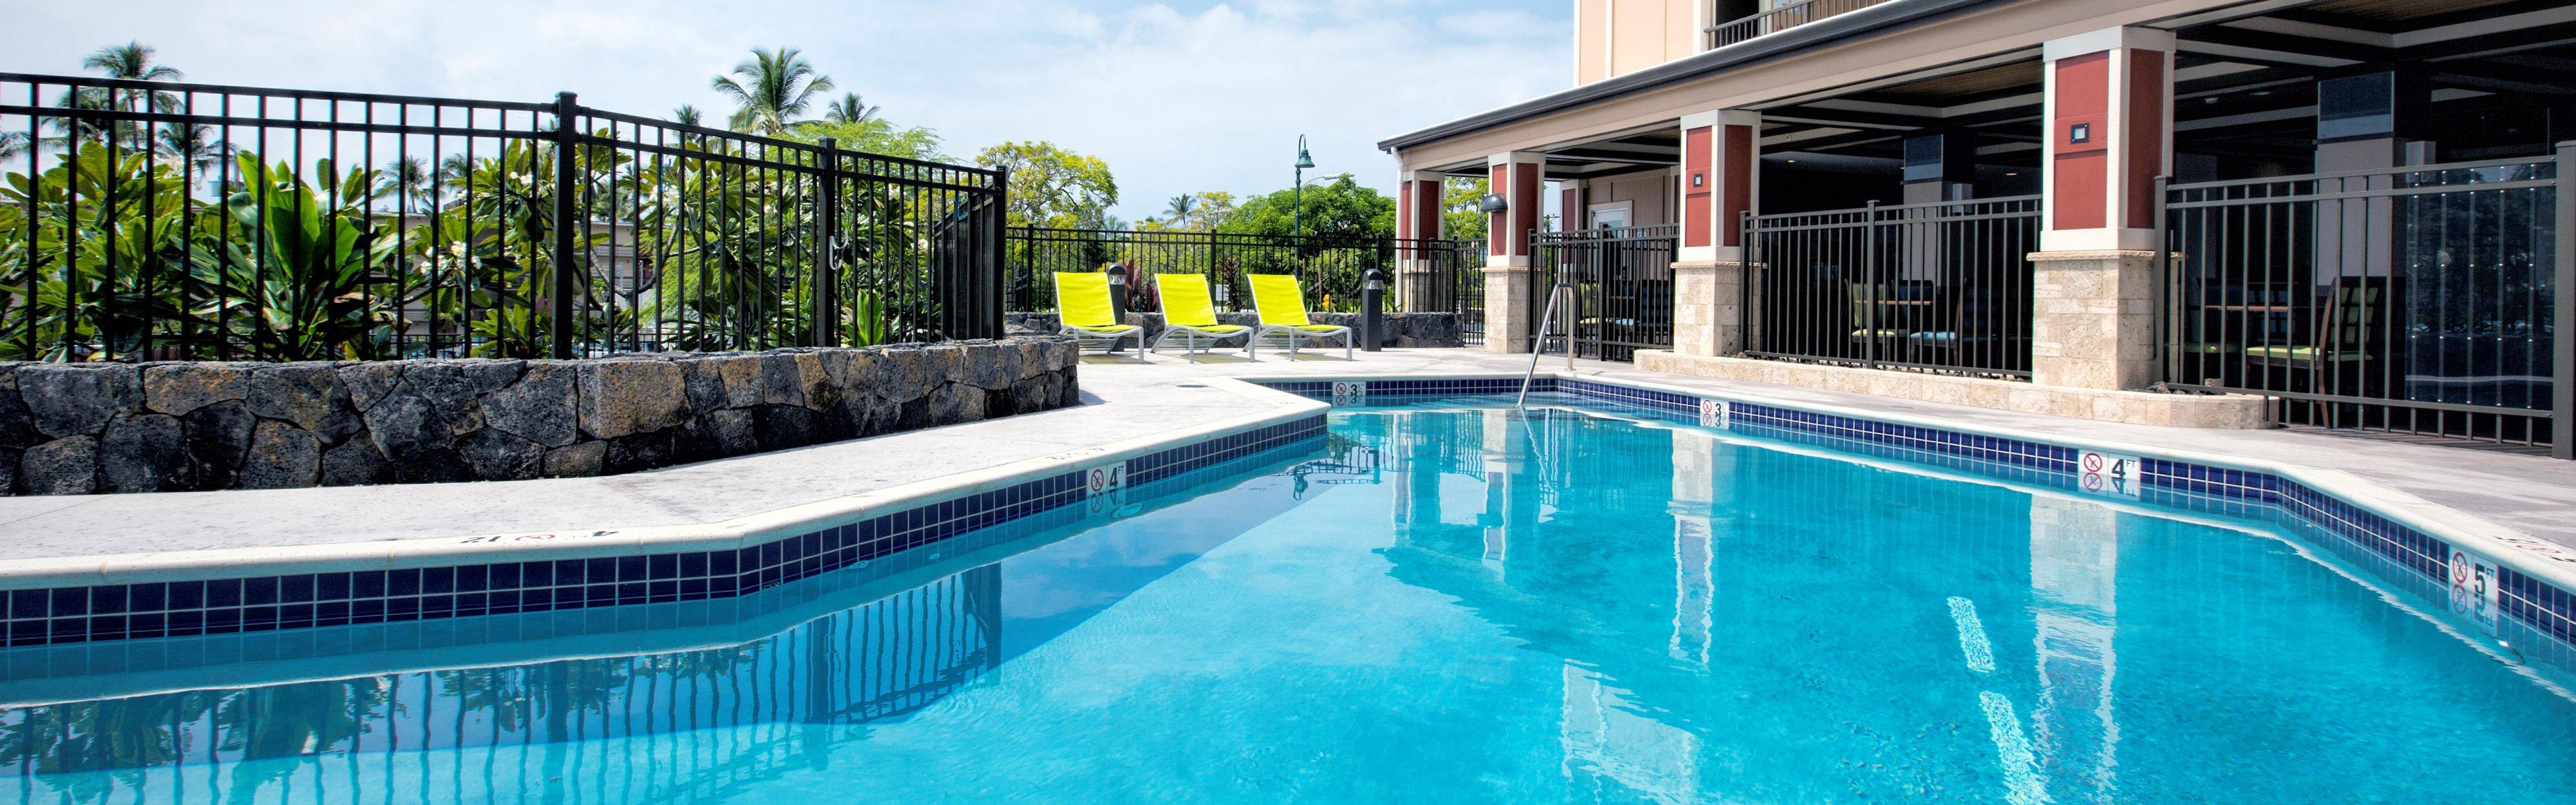 Holiday Inn Express & Suites Kailua-Kona image 2